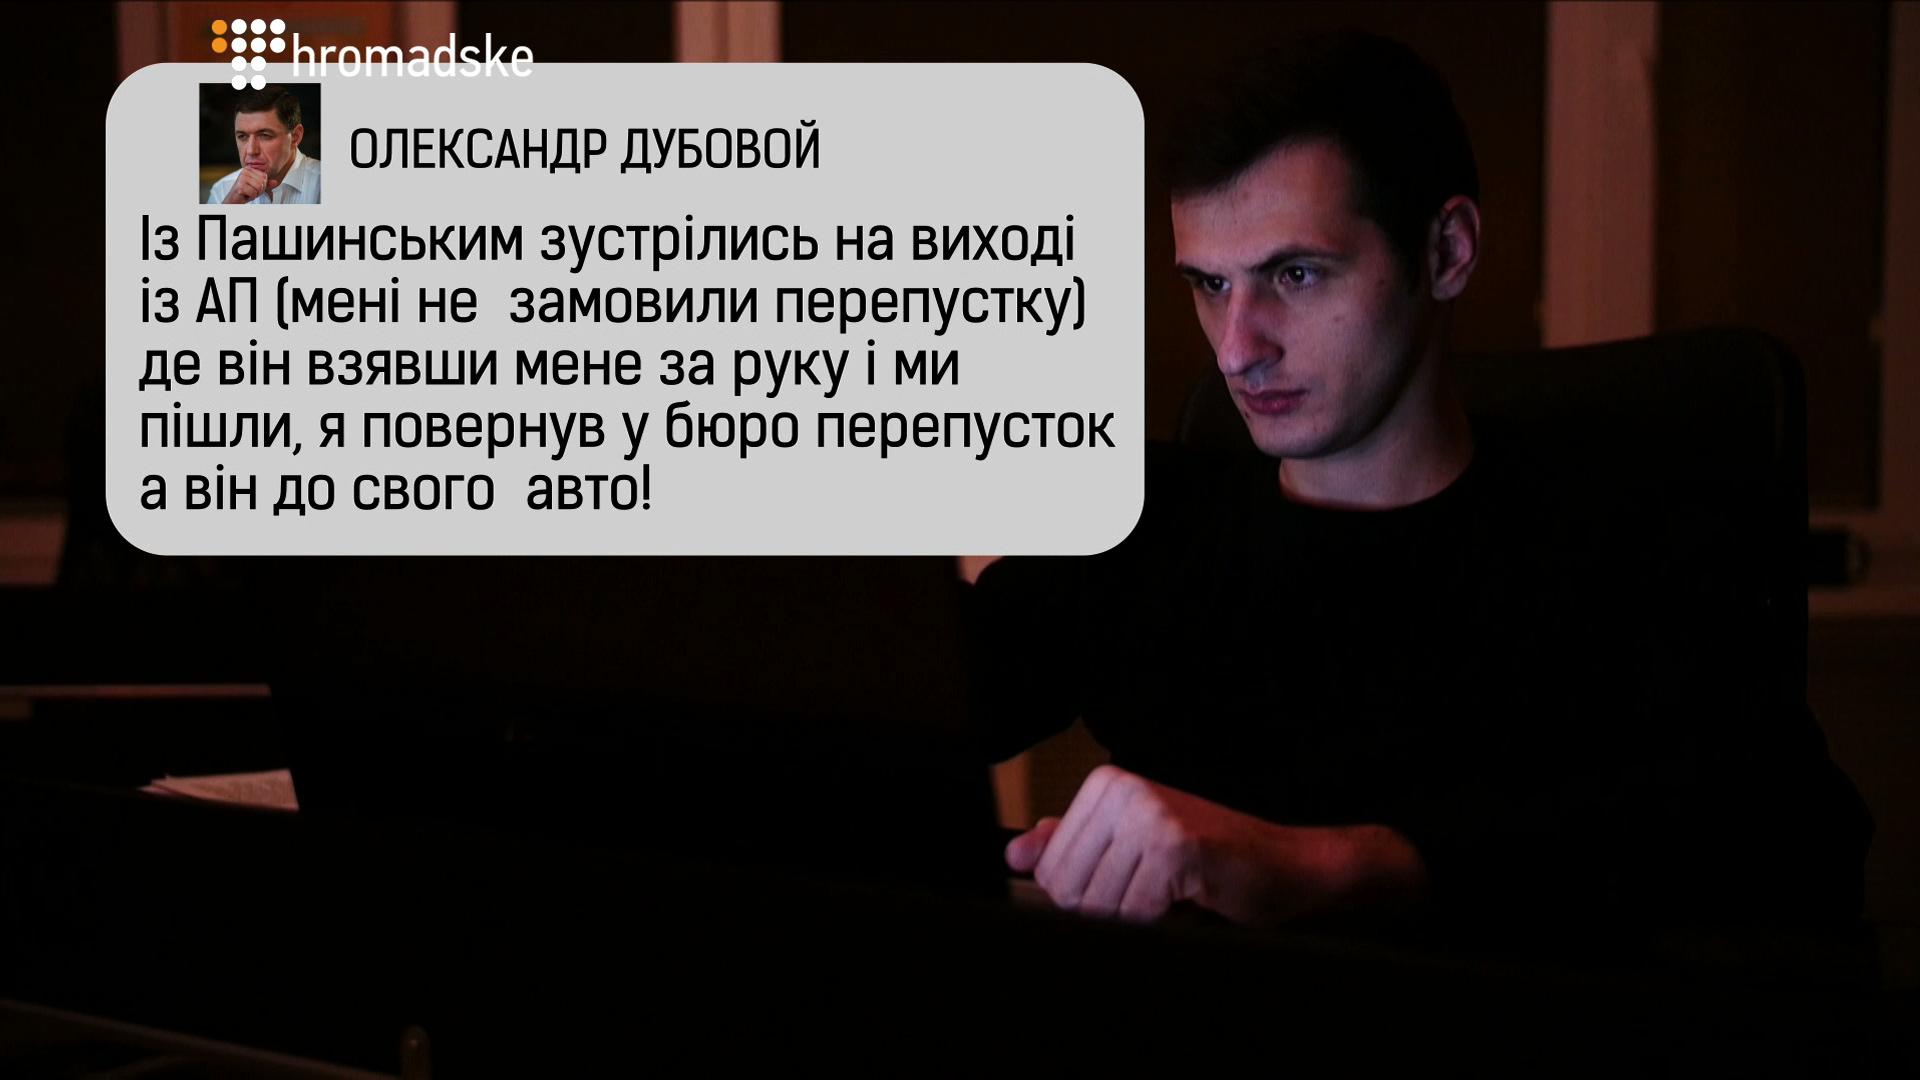 MOLDOVA_screen 9